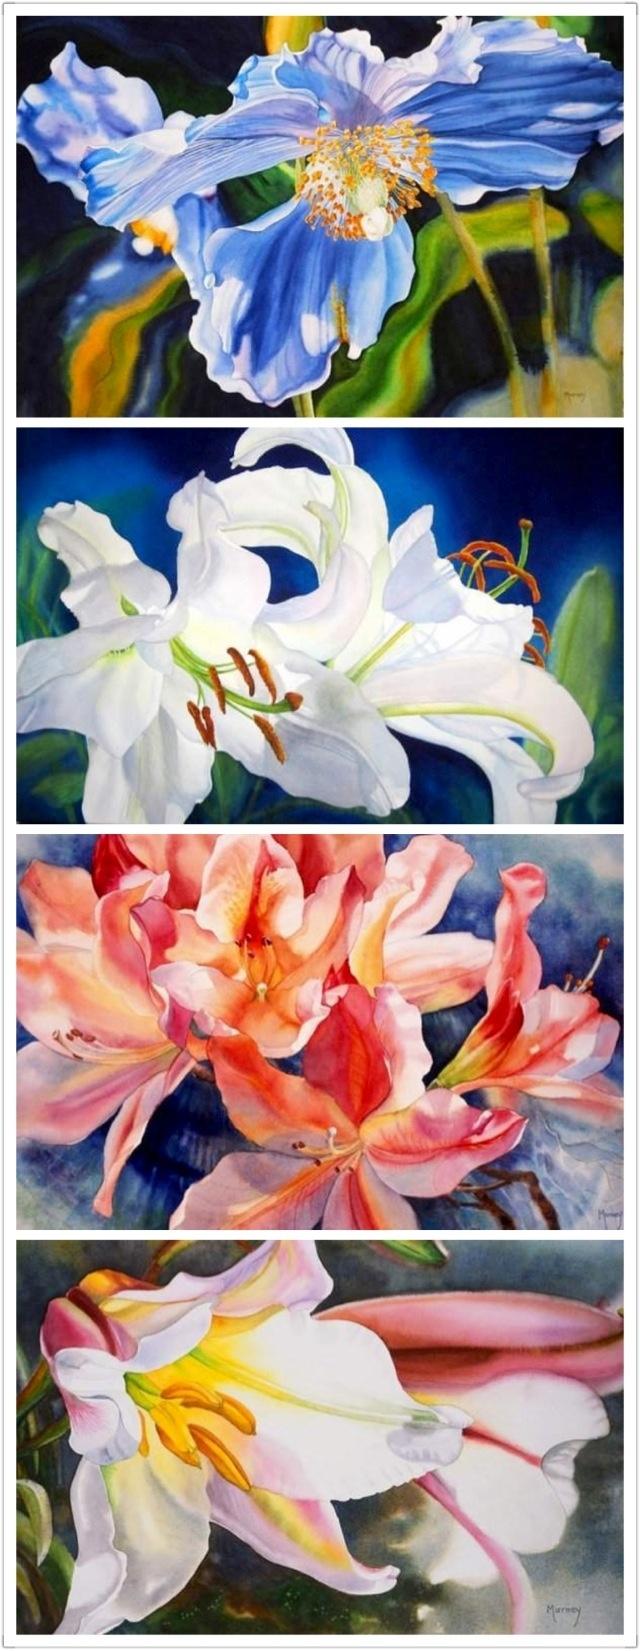 By Marney ward - watercolor flower